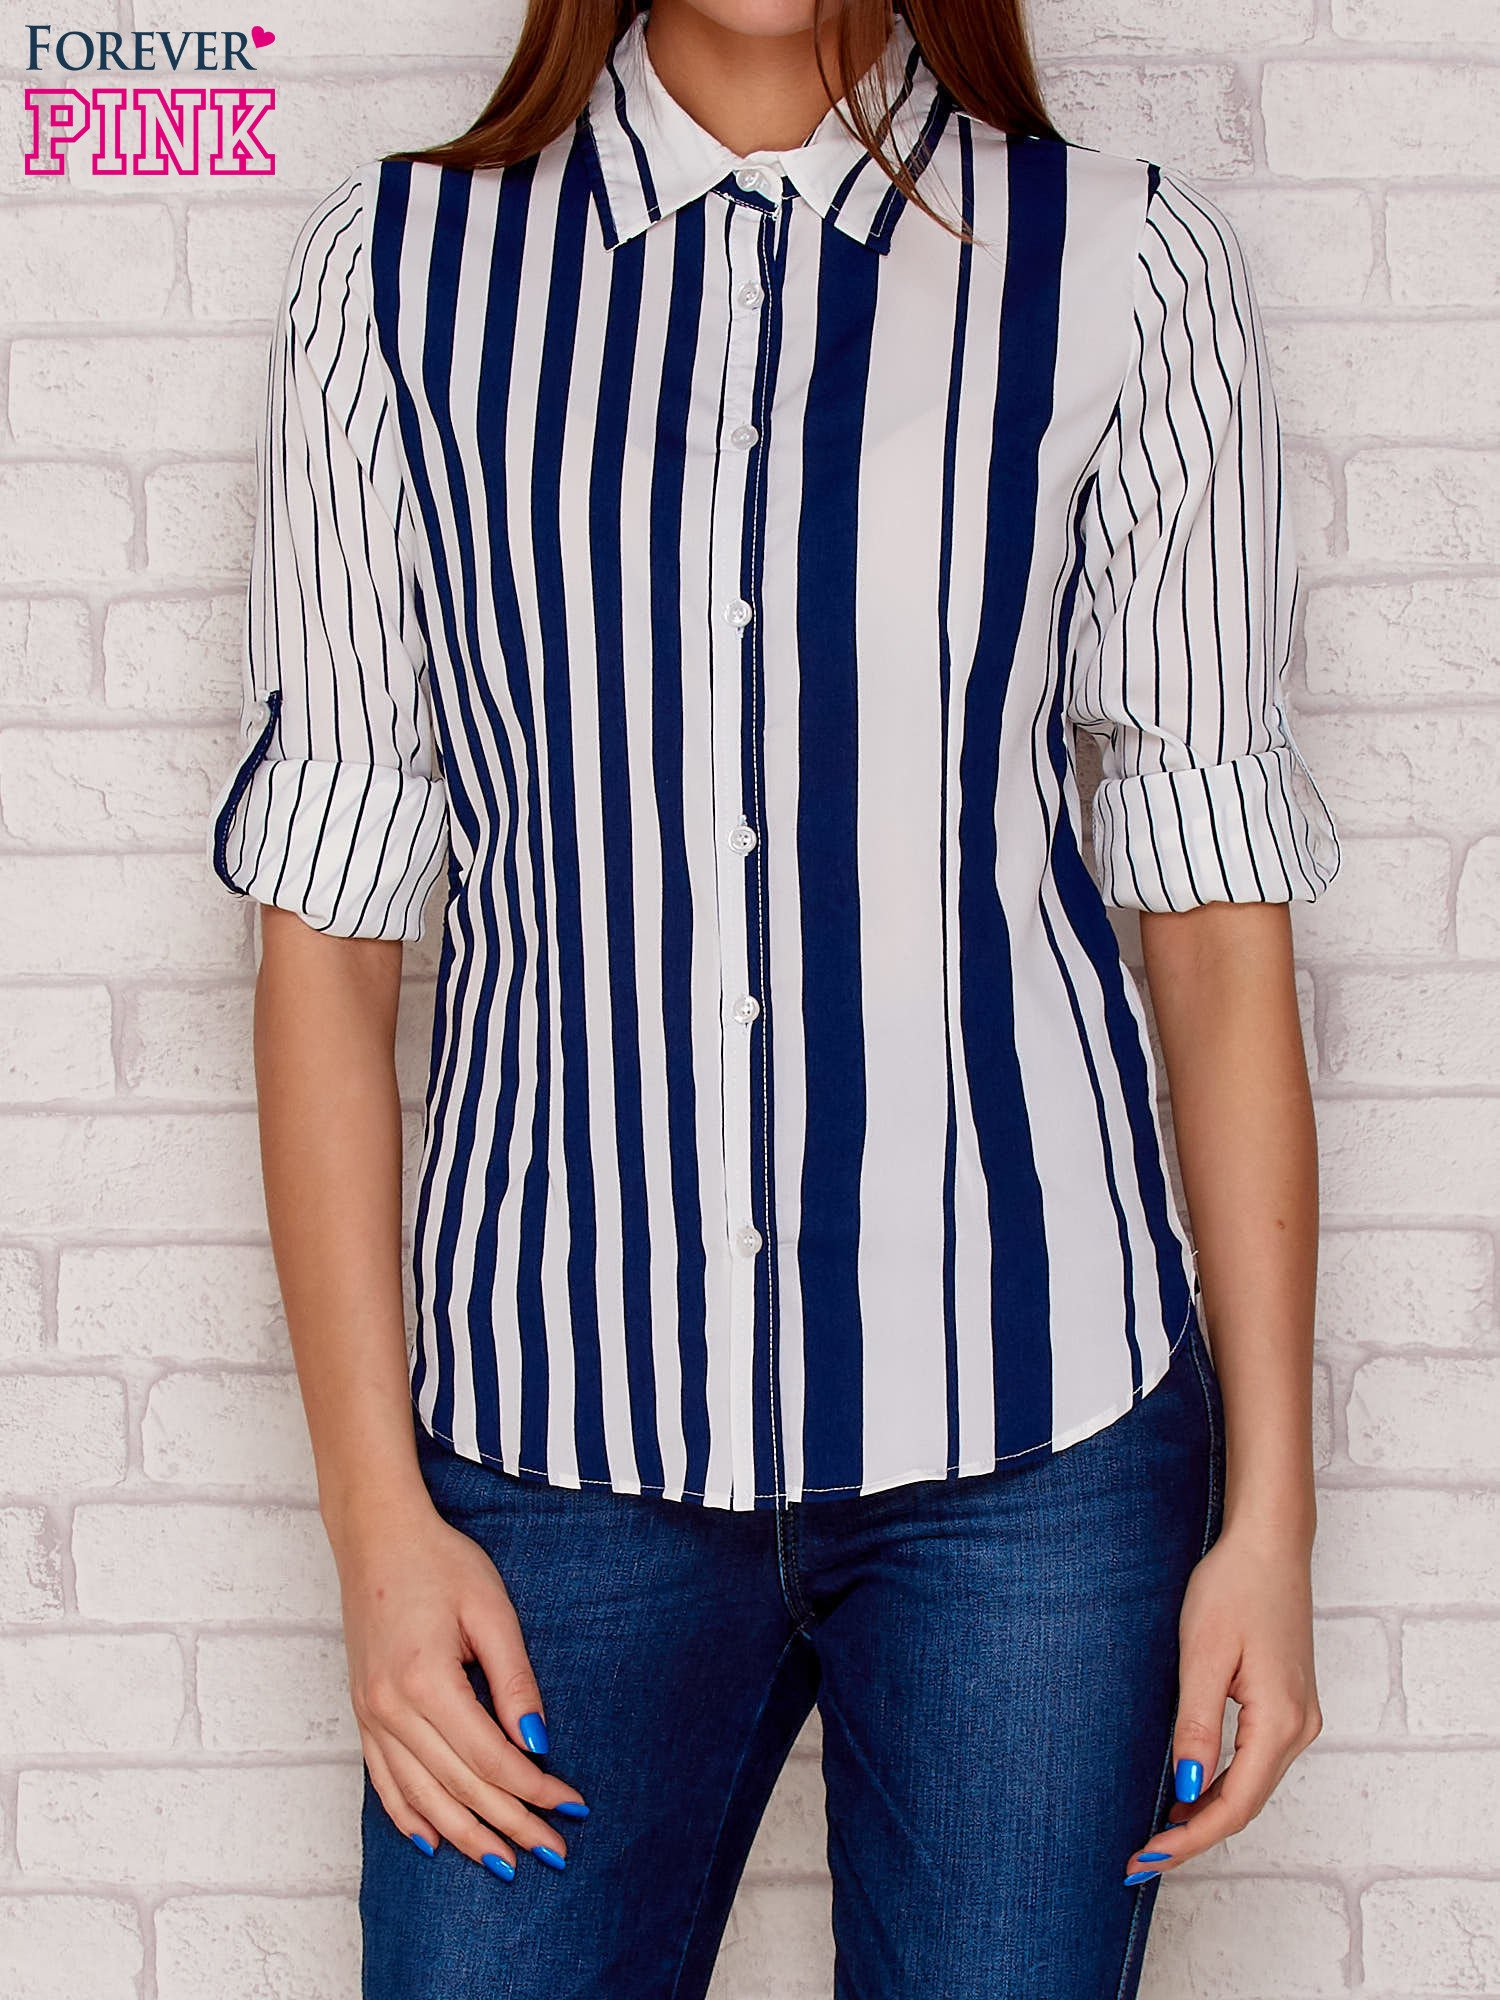 0341e31b9 Koszula damska w pionowe paski granatowa - Koszula w paski - sklep ...